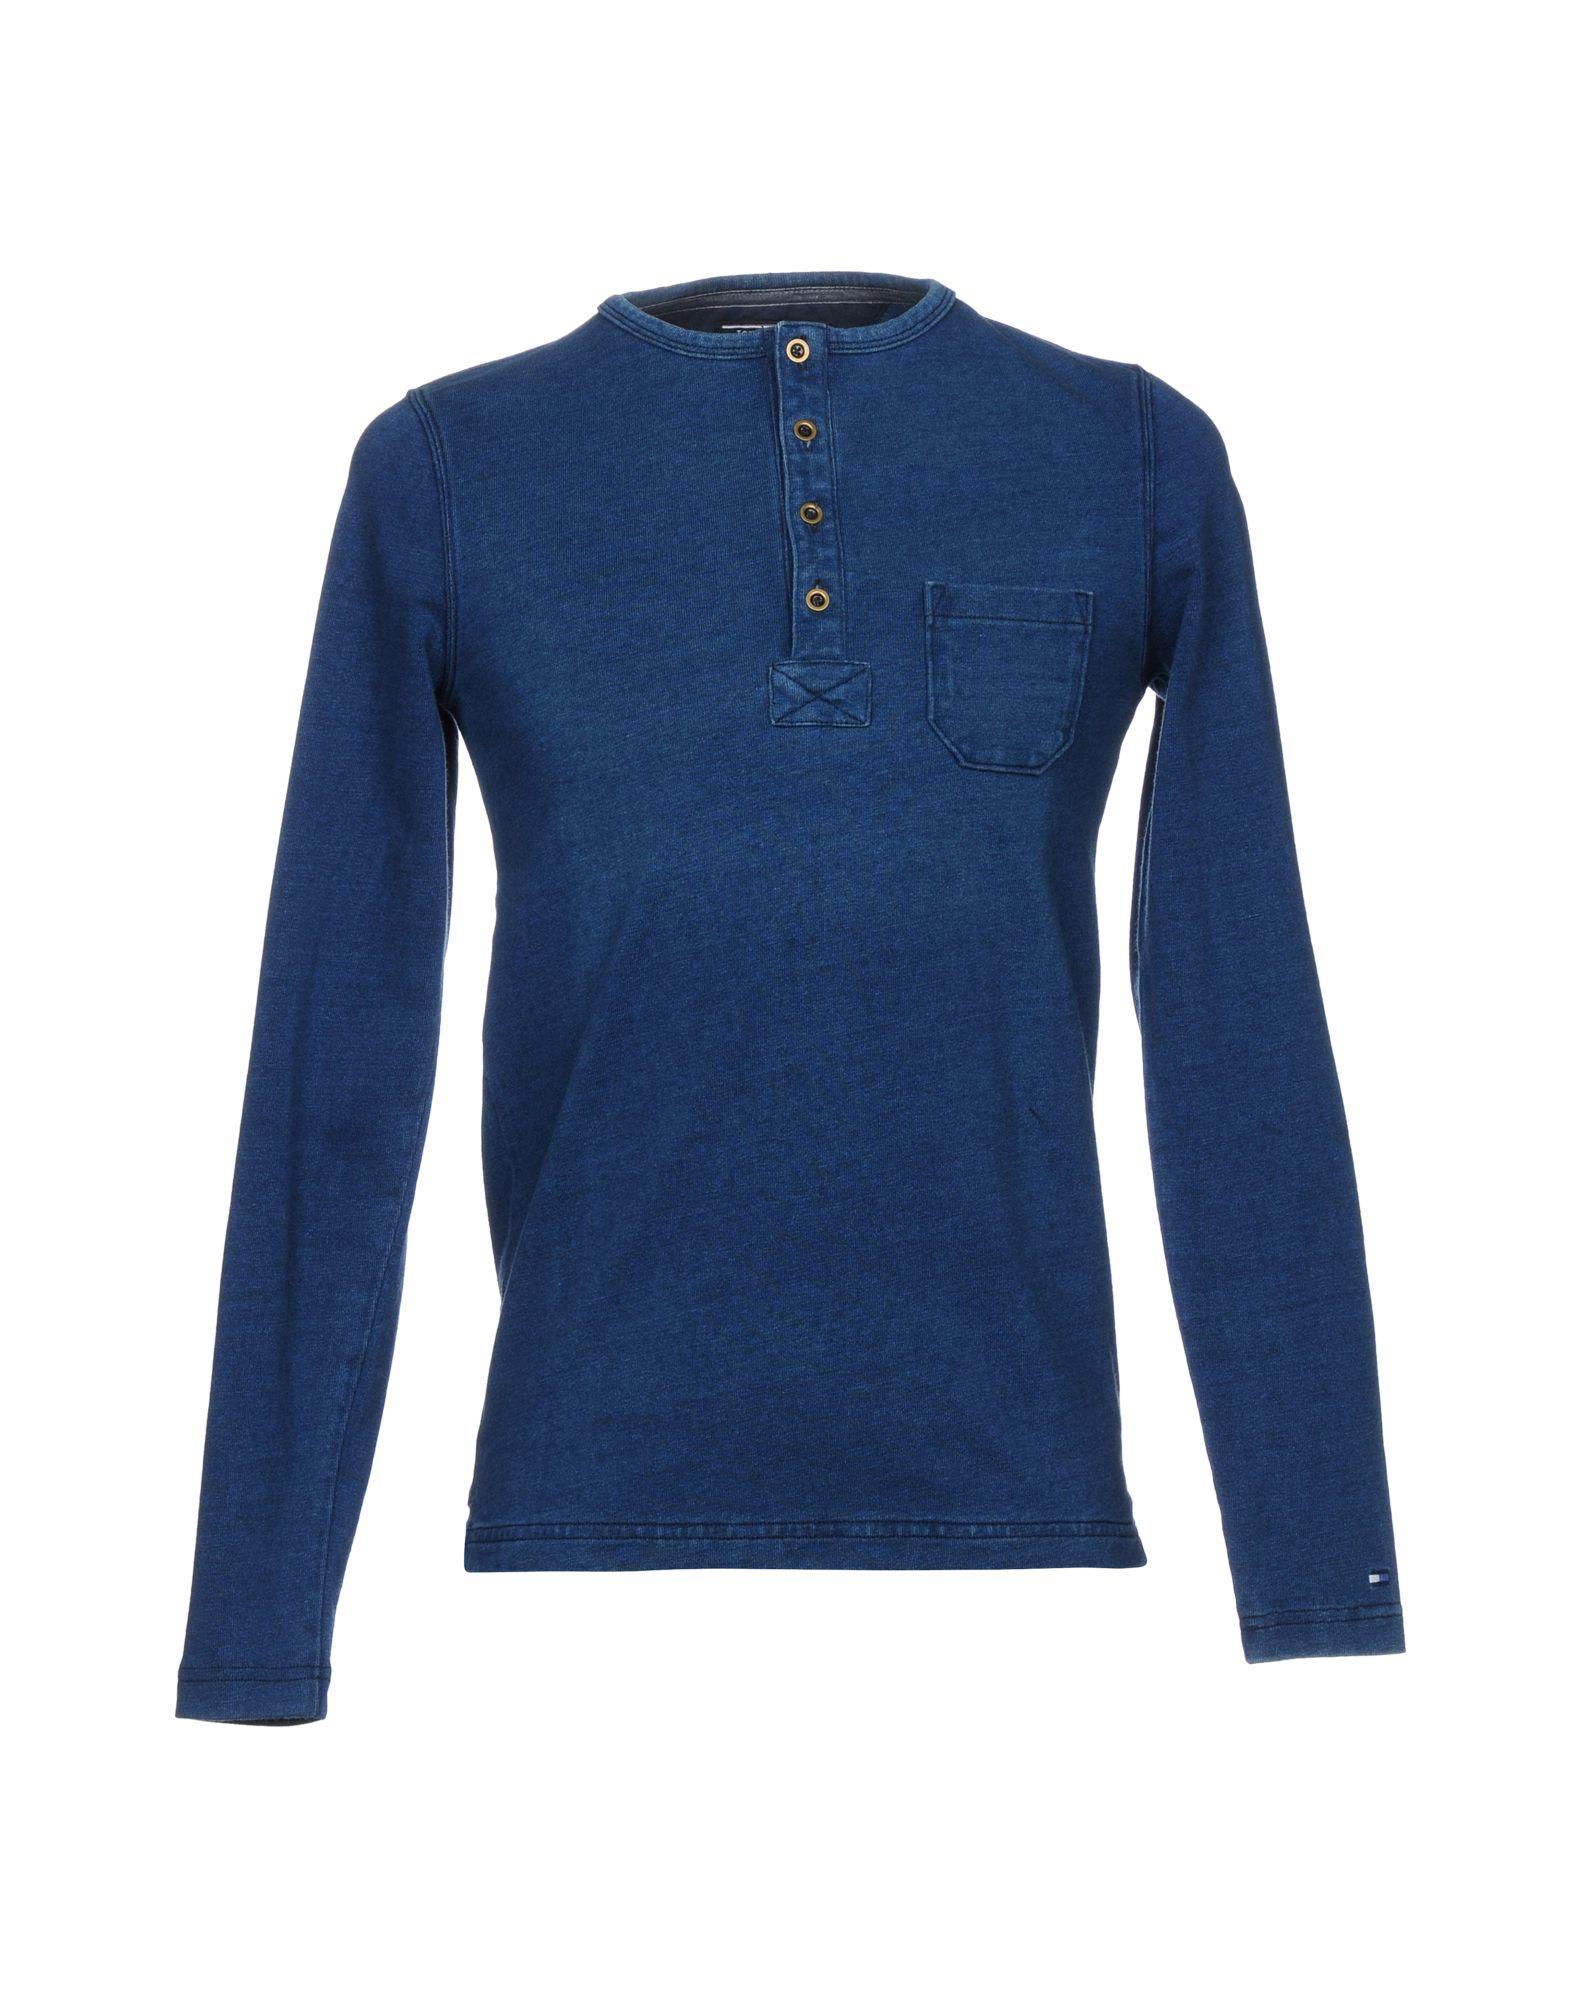 T-Shirt T-Shirt T-Shirt Tommy Hilfiger Uomo - 12172804OL 263e21